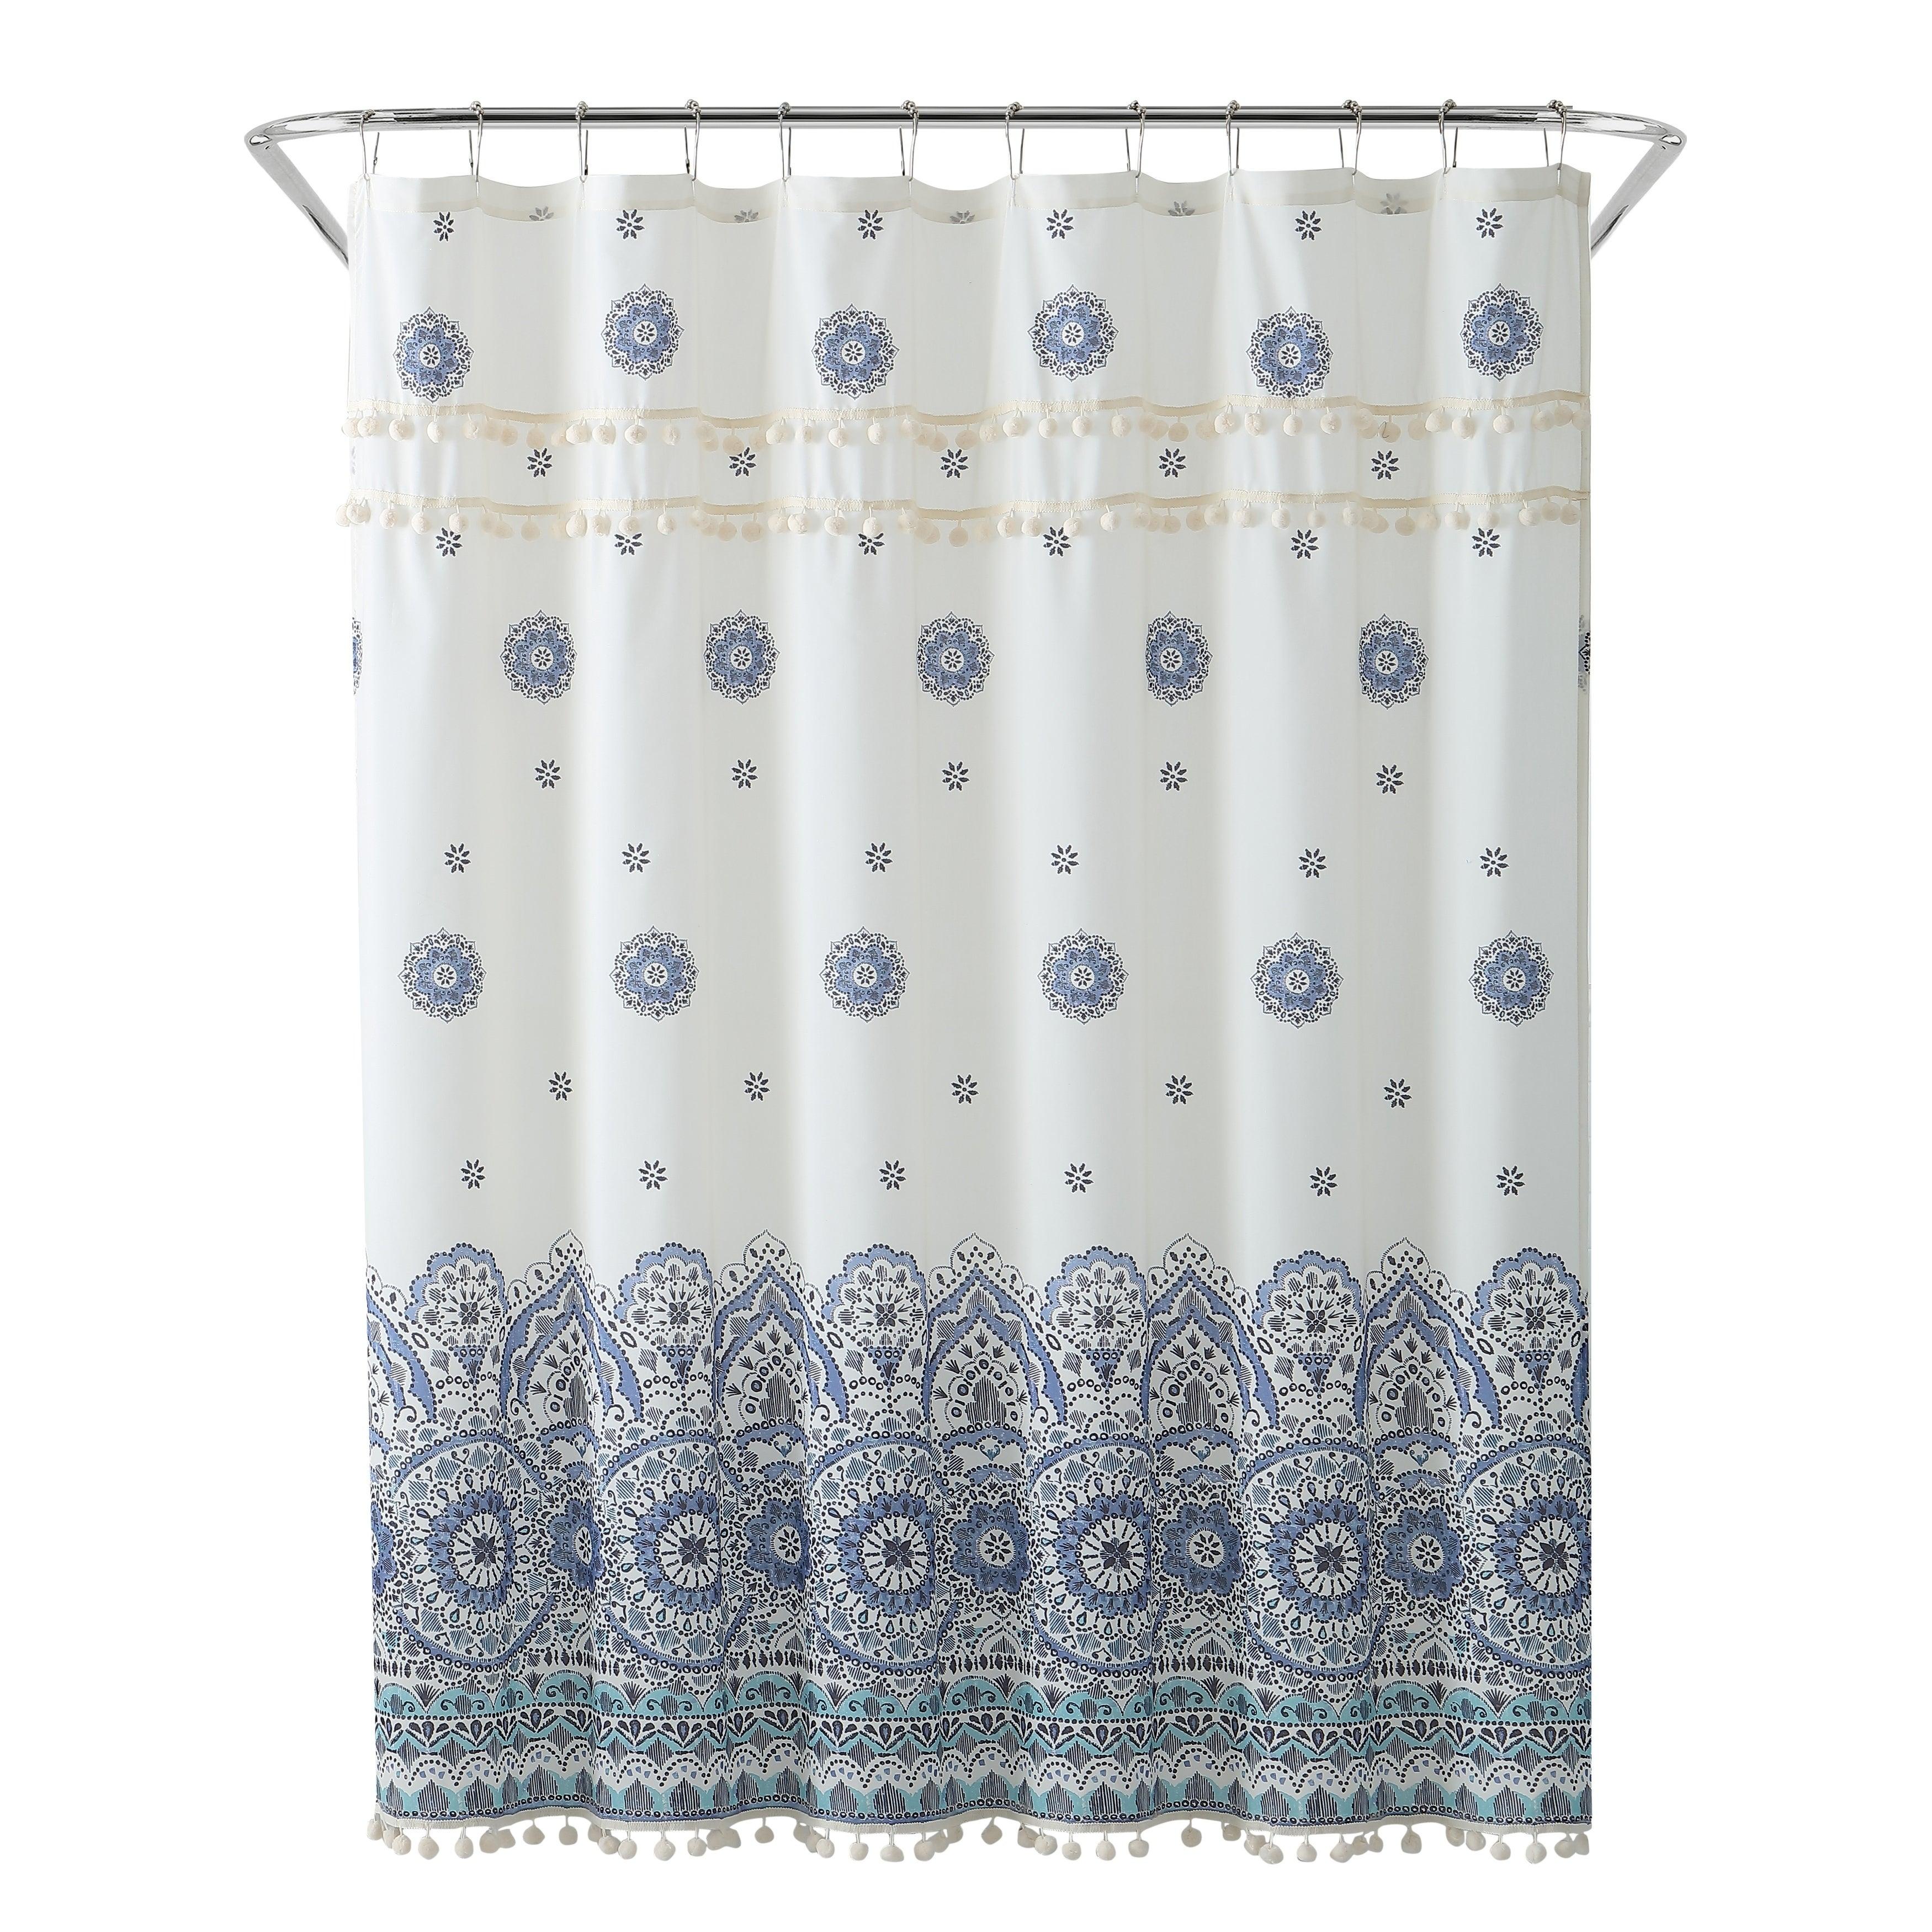 Shop Black Friday Deals On Peach Oak Shower Curtain Overstock 23477393